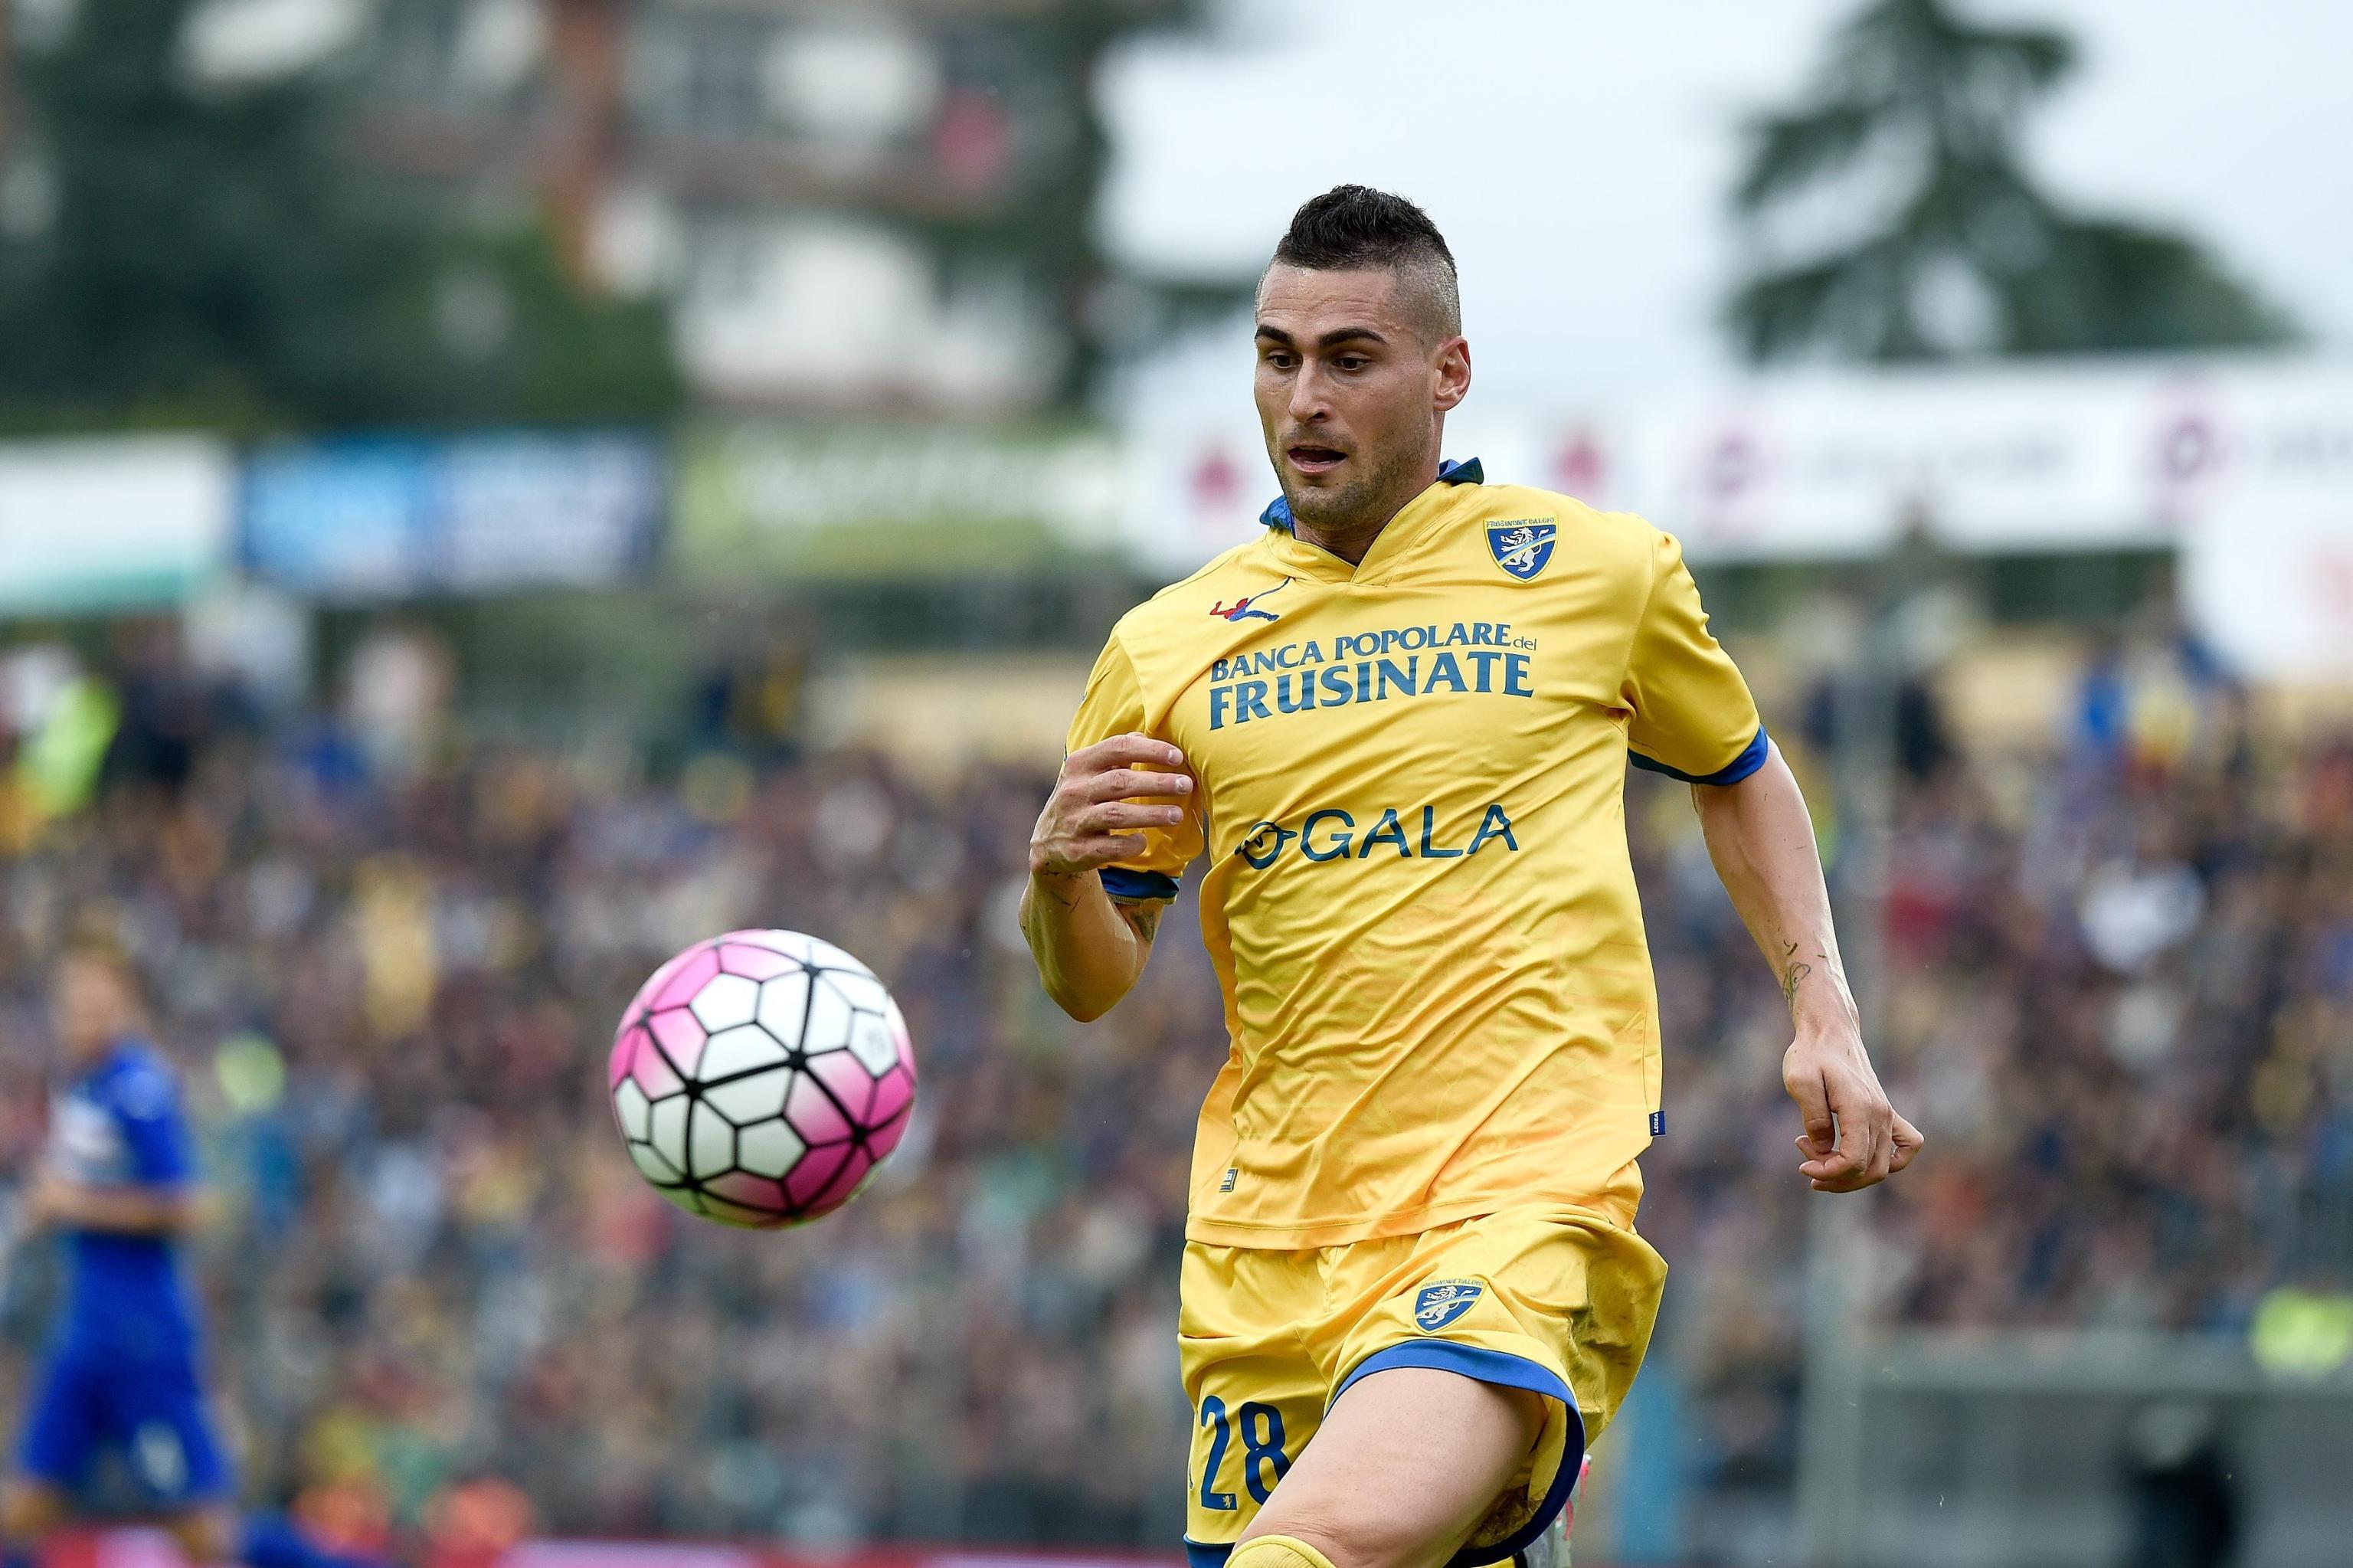 Soccer: Serie A, Frosinone-Sampdoria